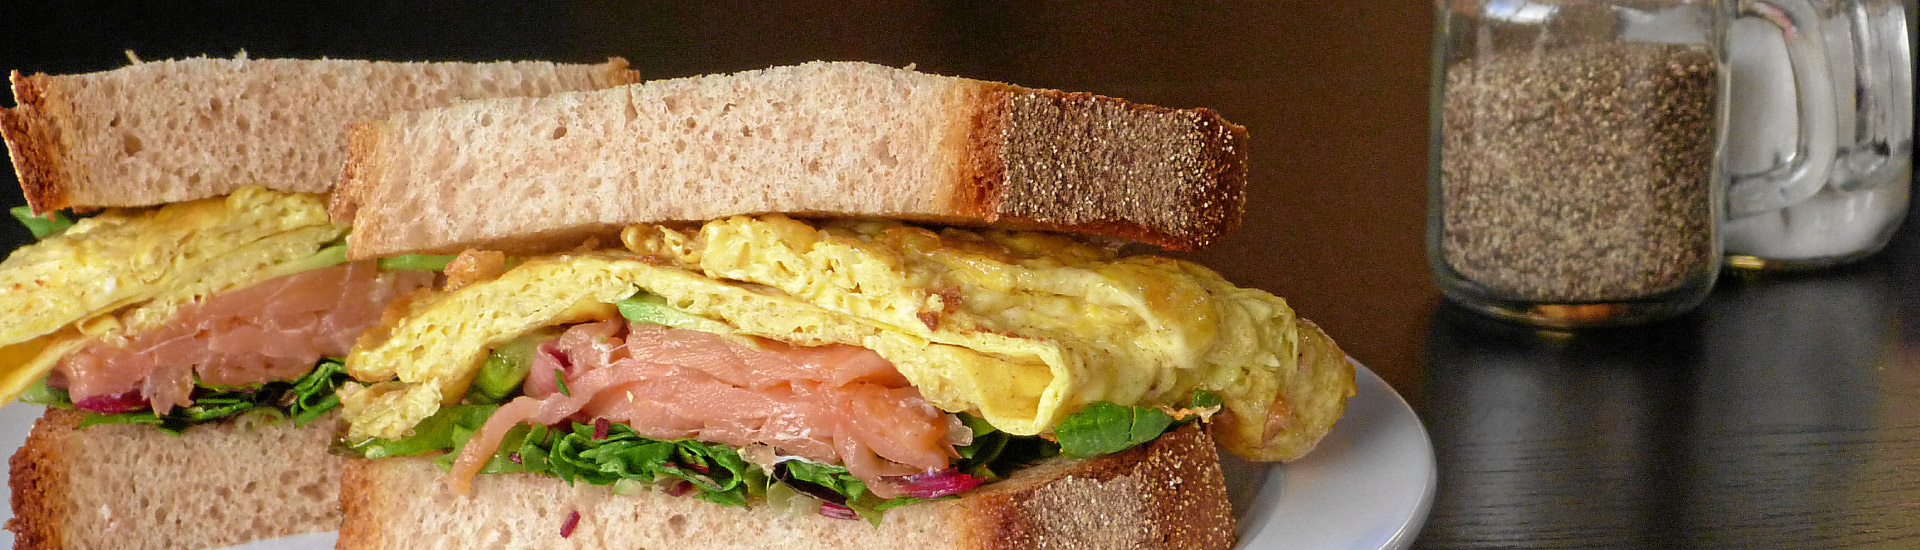 Gravlax Egg Sandwich